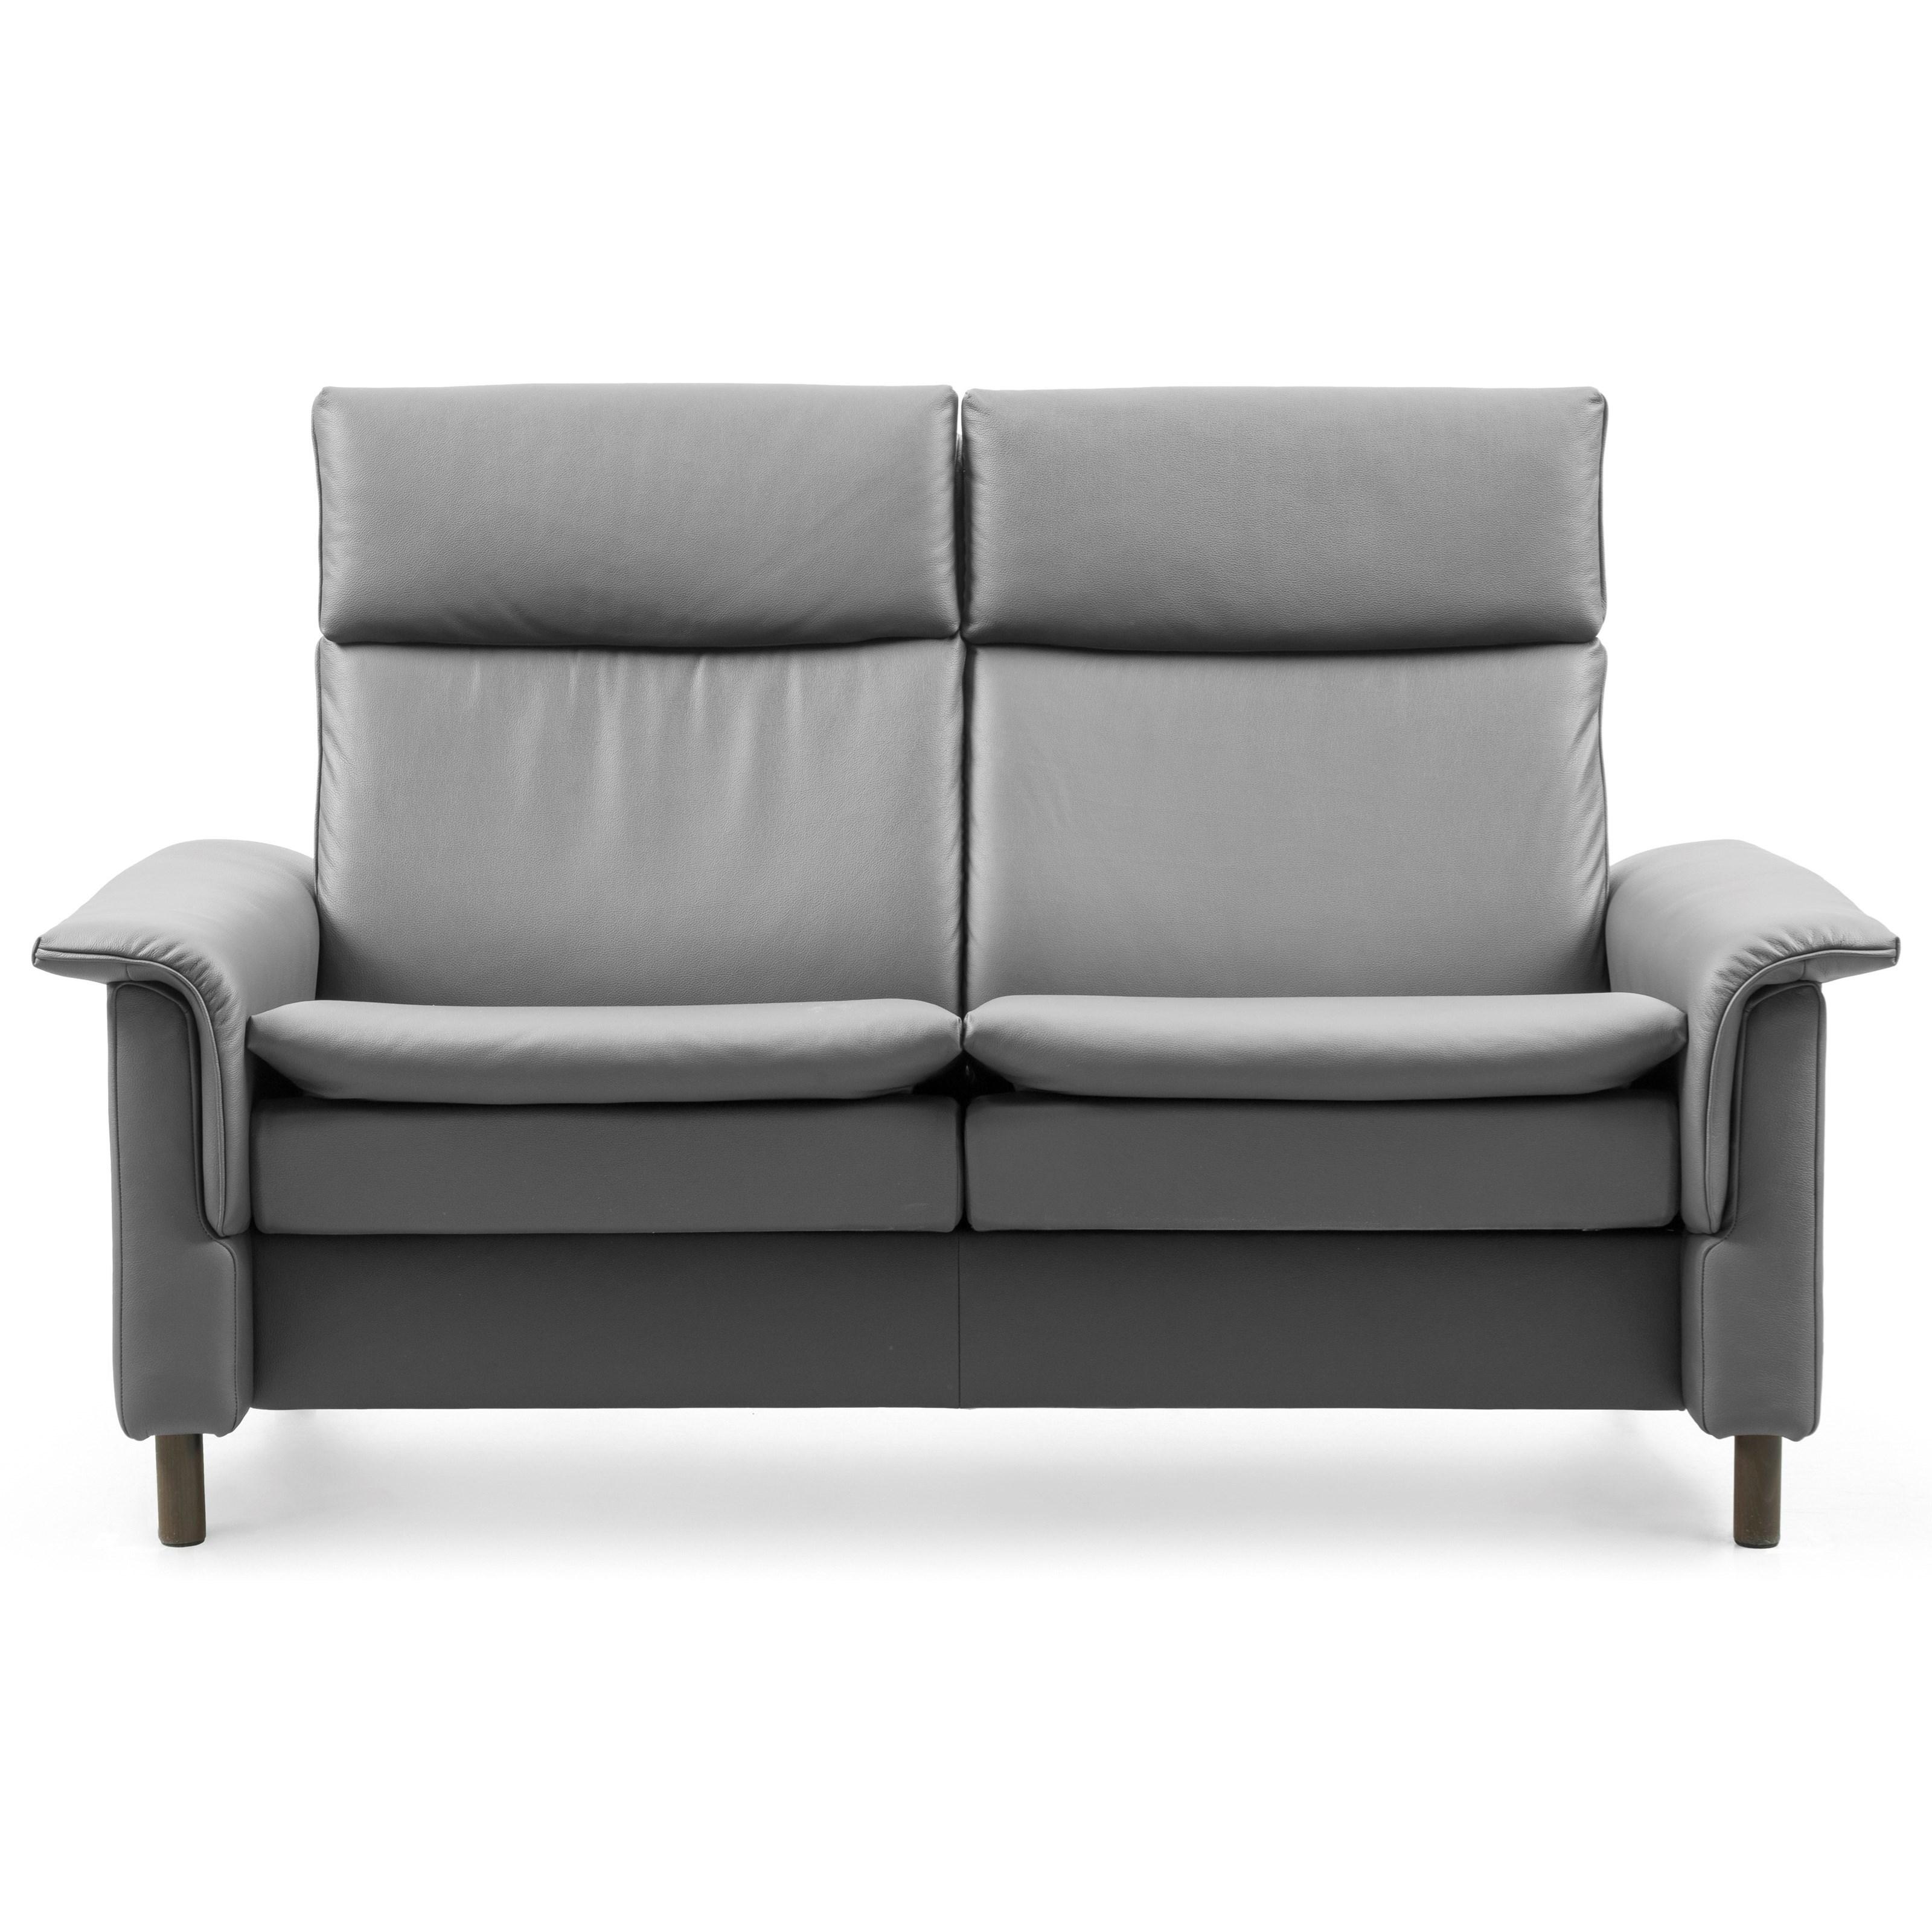 Aurora High-Back Reclining Loveseat by Stressless at Bennett's Furniture and Mattresses